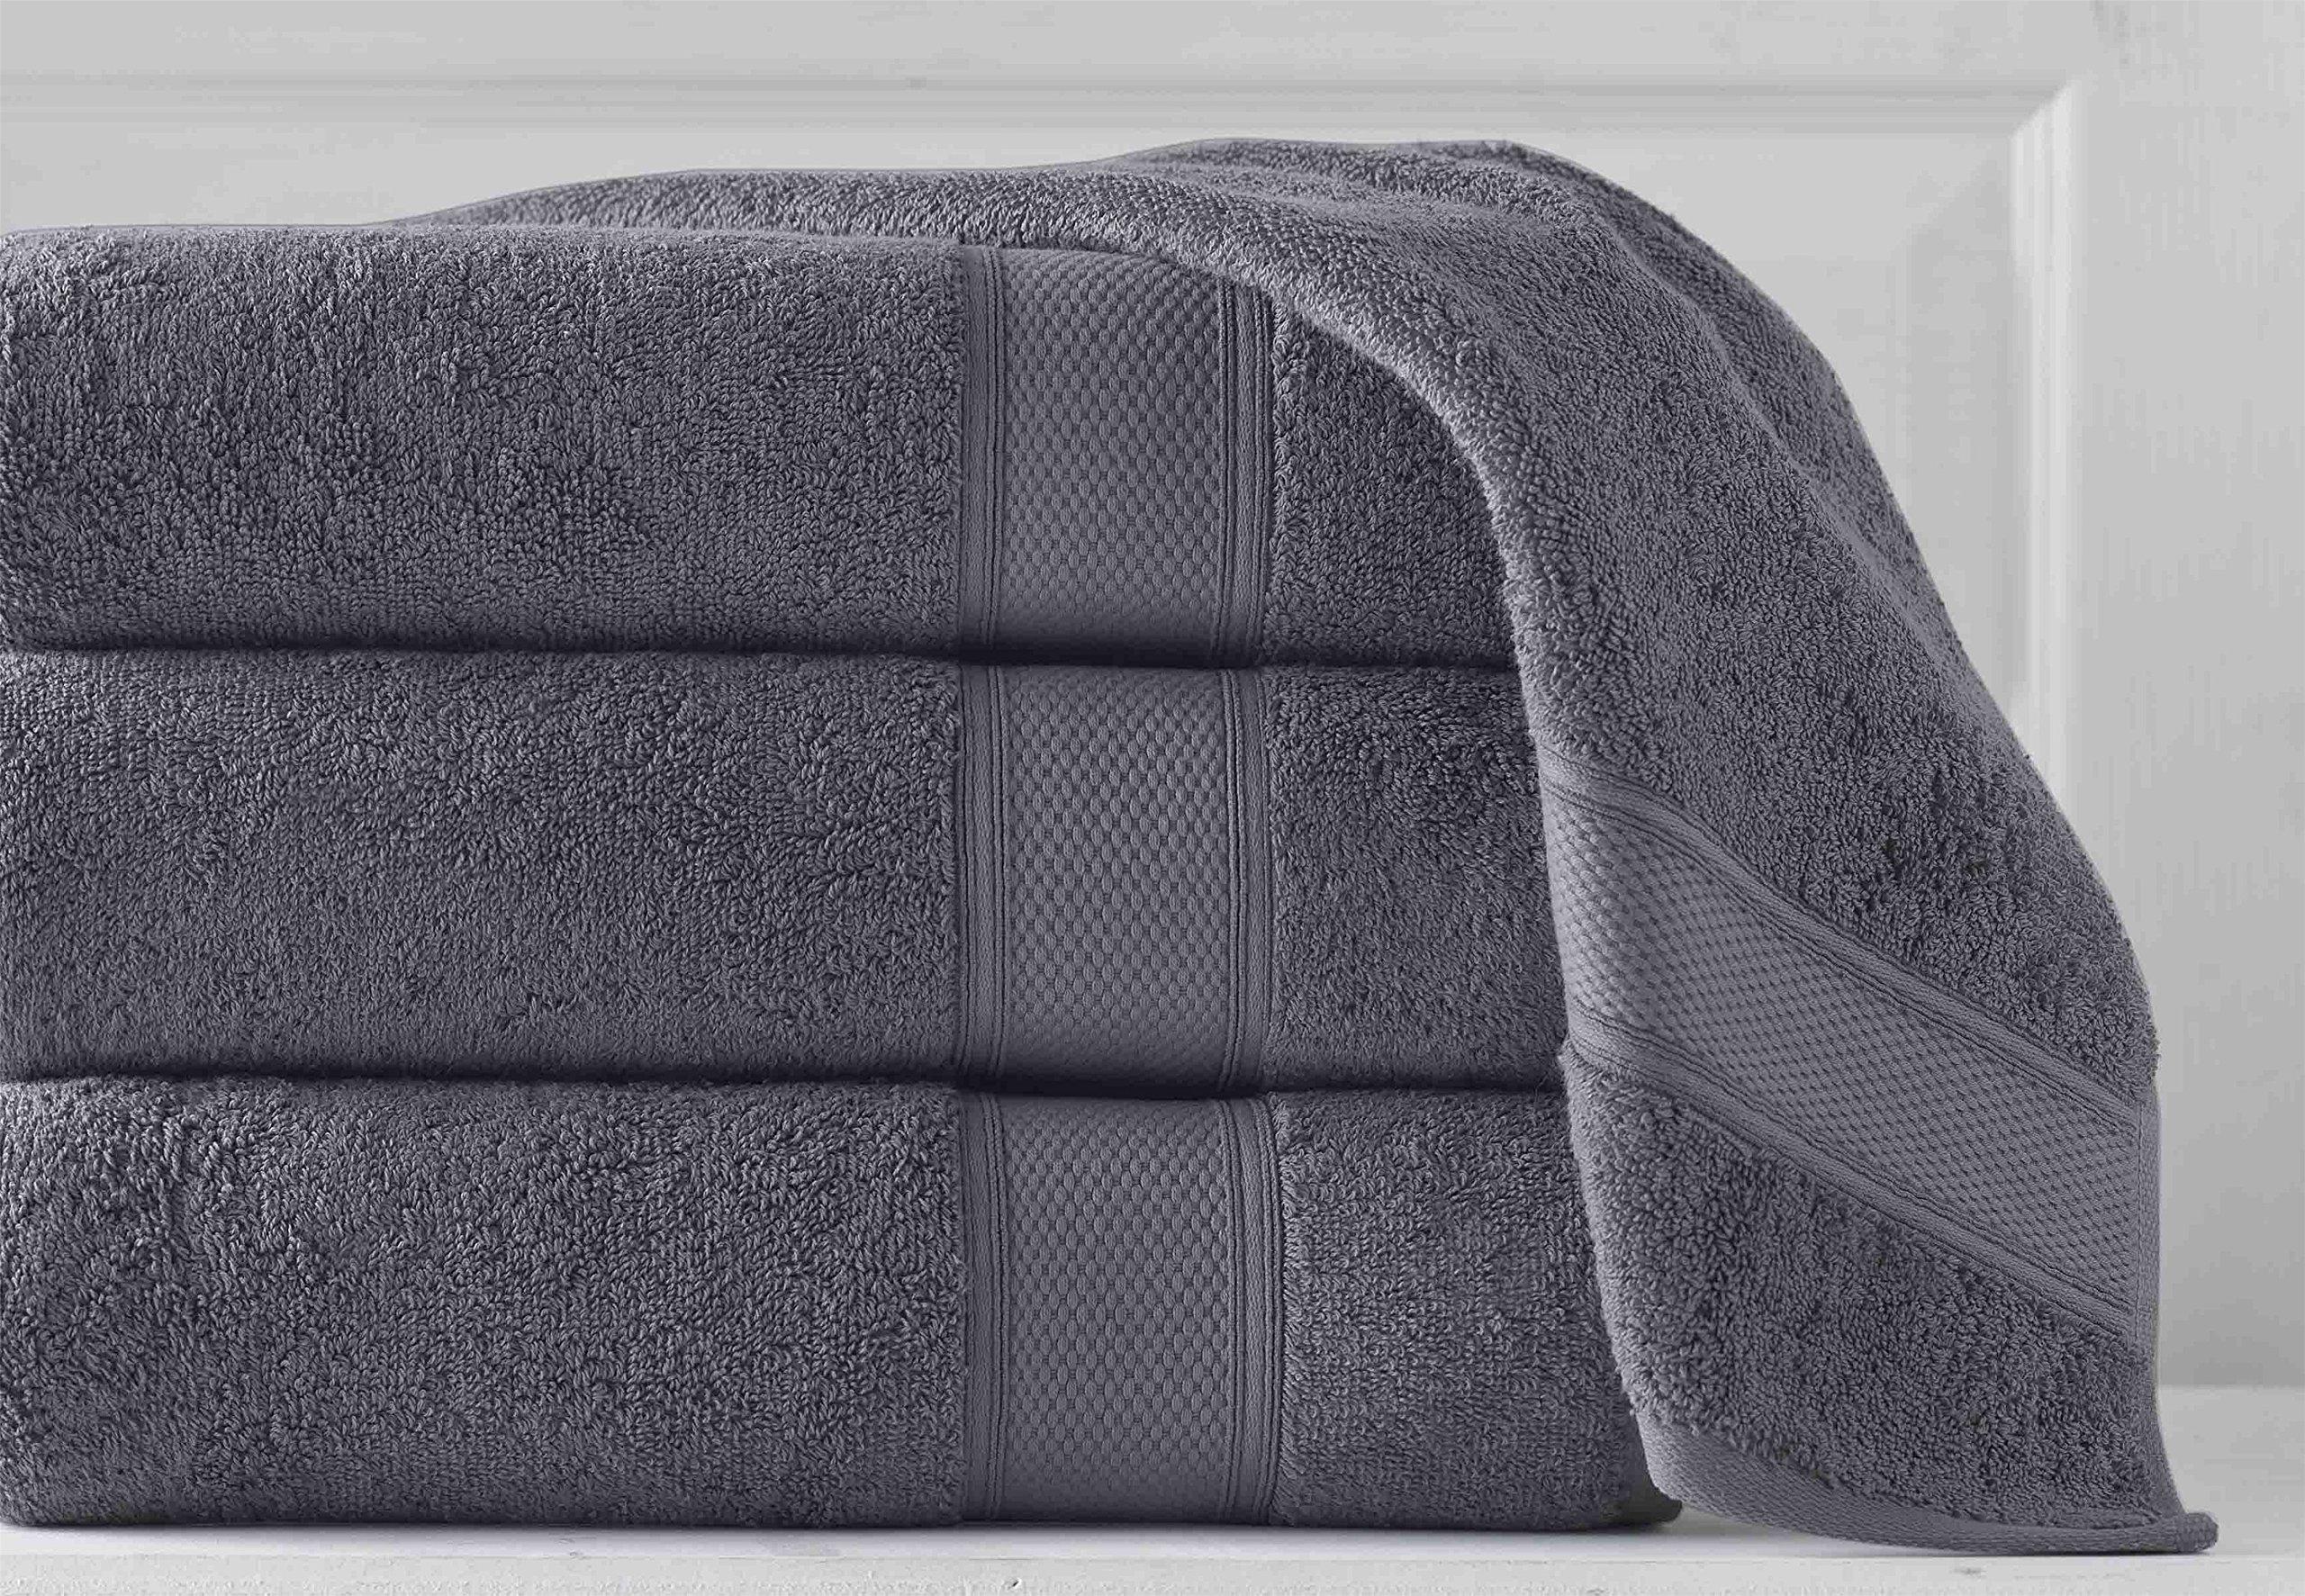 Grund Luxury Spa Towel, 100% Certified Organic Turkish Cotton, 36-Inch by 72-Inch, Slate Gray, 1 piece